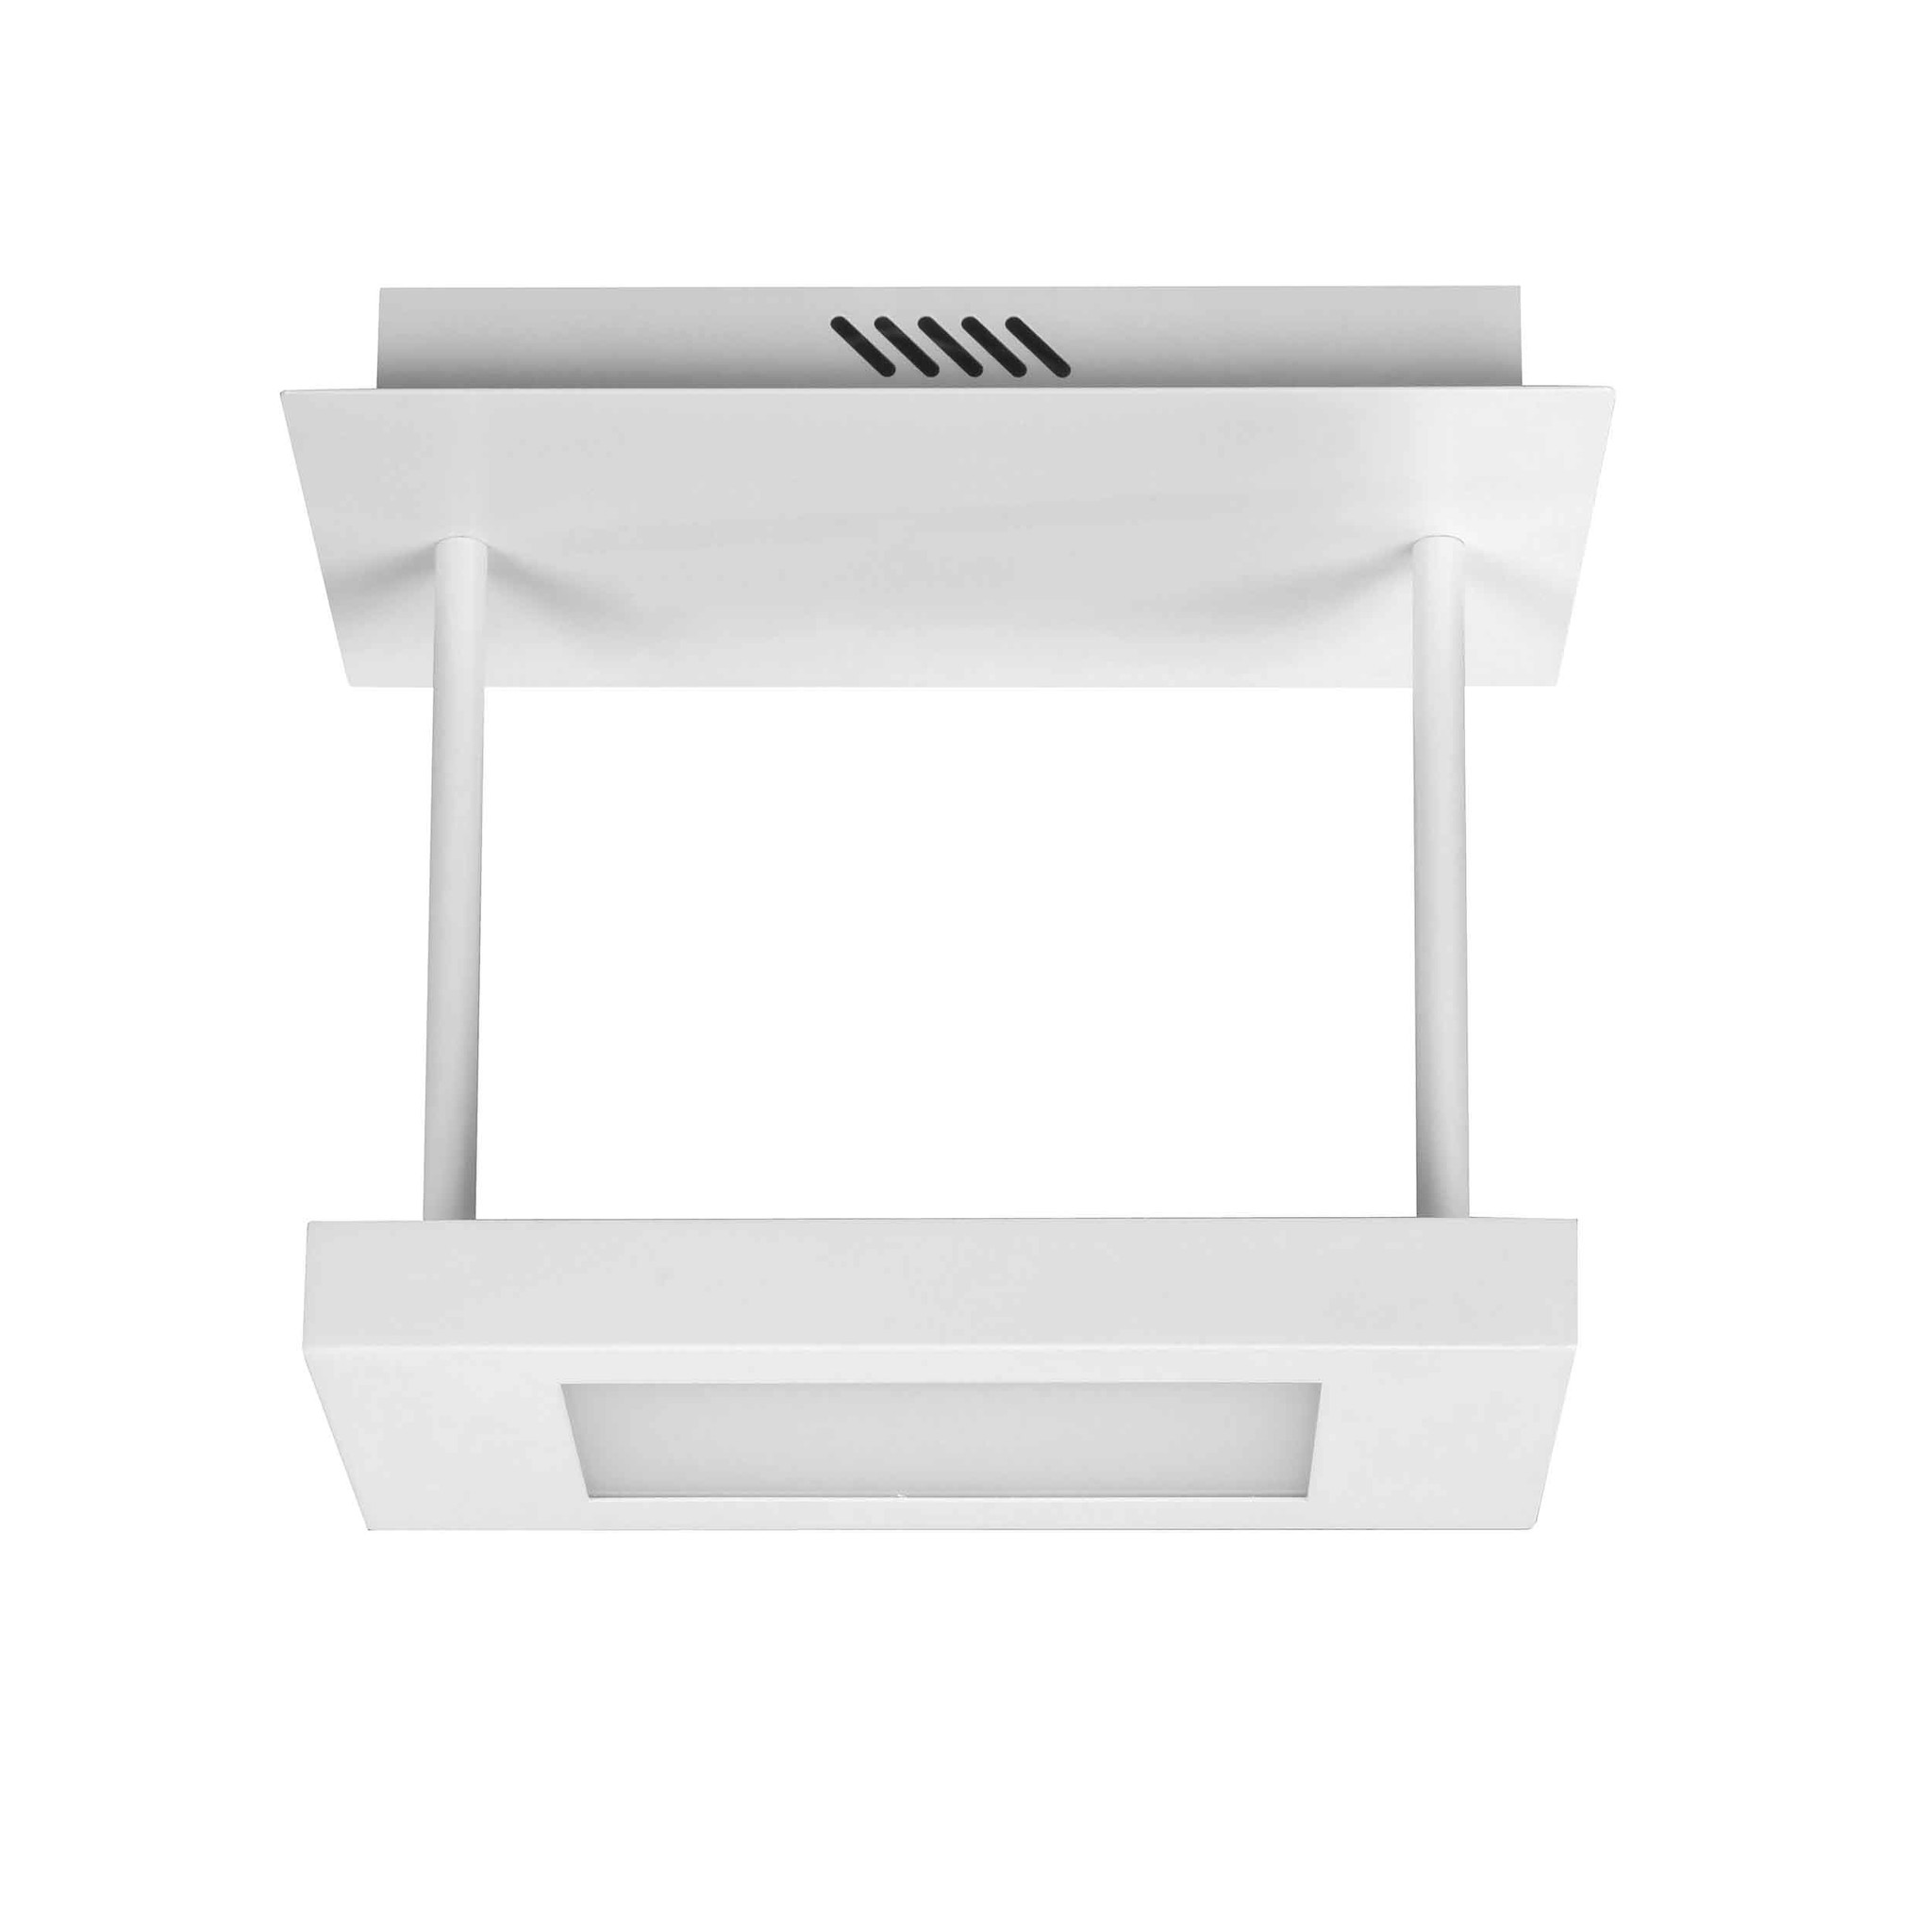 Highlight Plafondlamp Cloud rechthoek - L 30 cm B 15 cm - wit